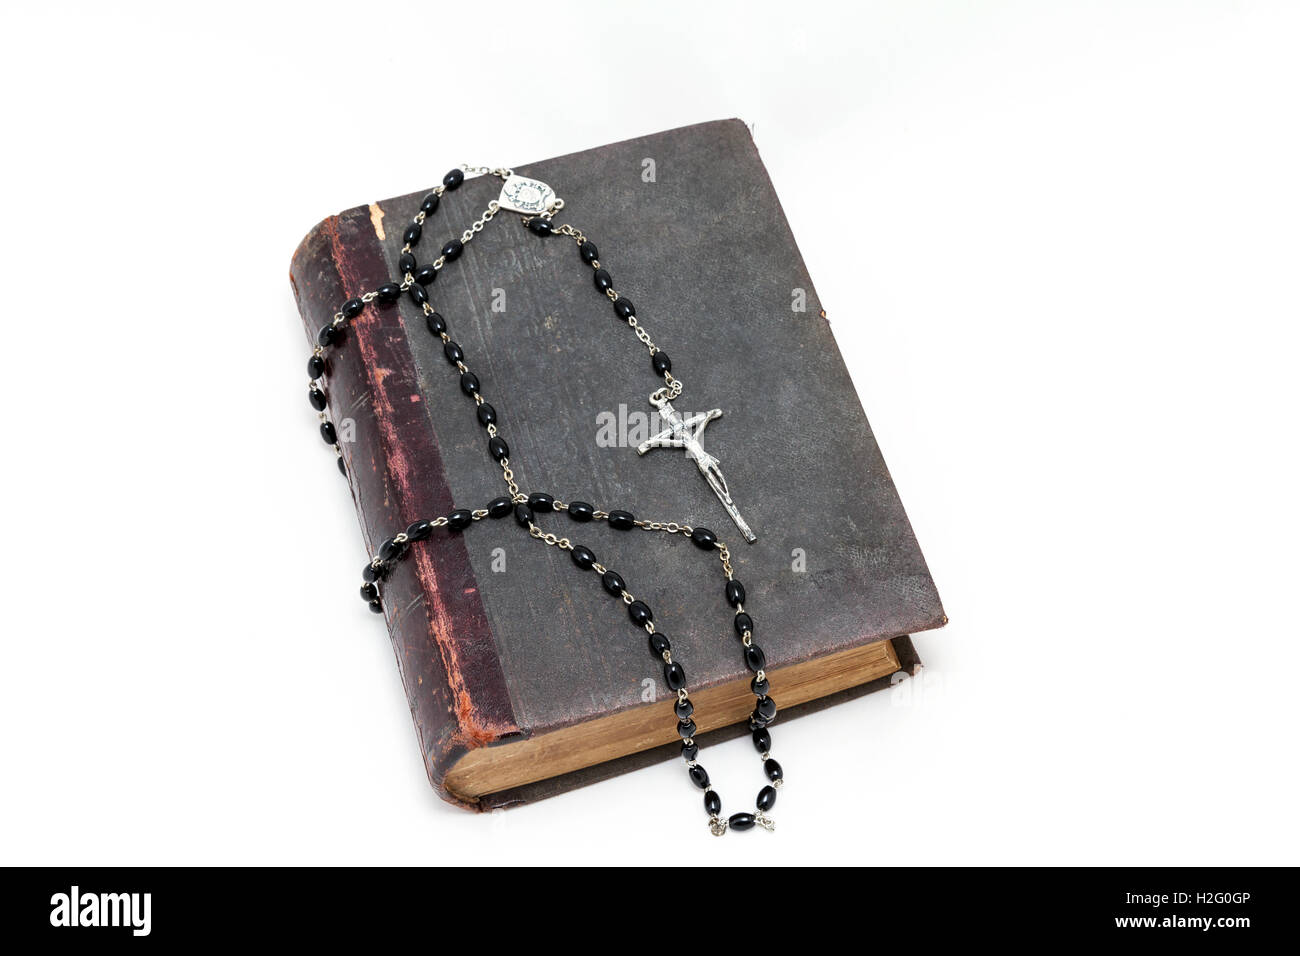 Ancient books and rosary Catholic (prayer beads) (on white background) - Stock Image